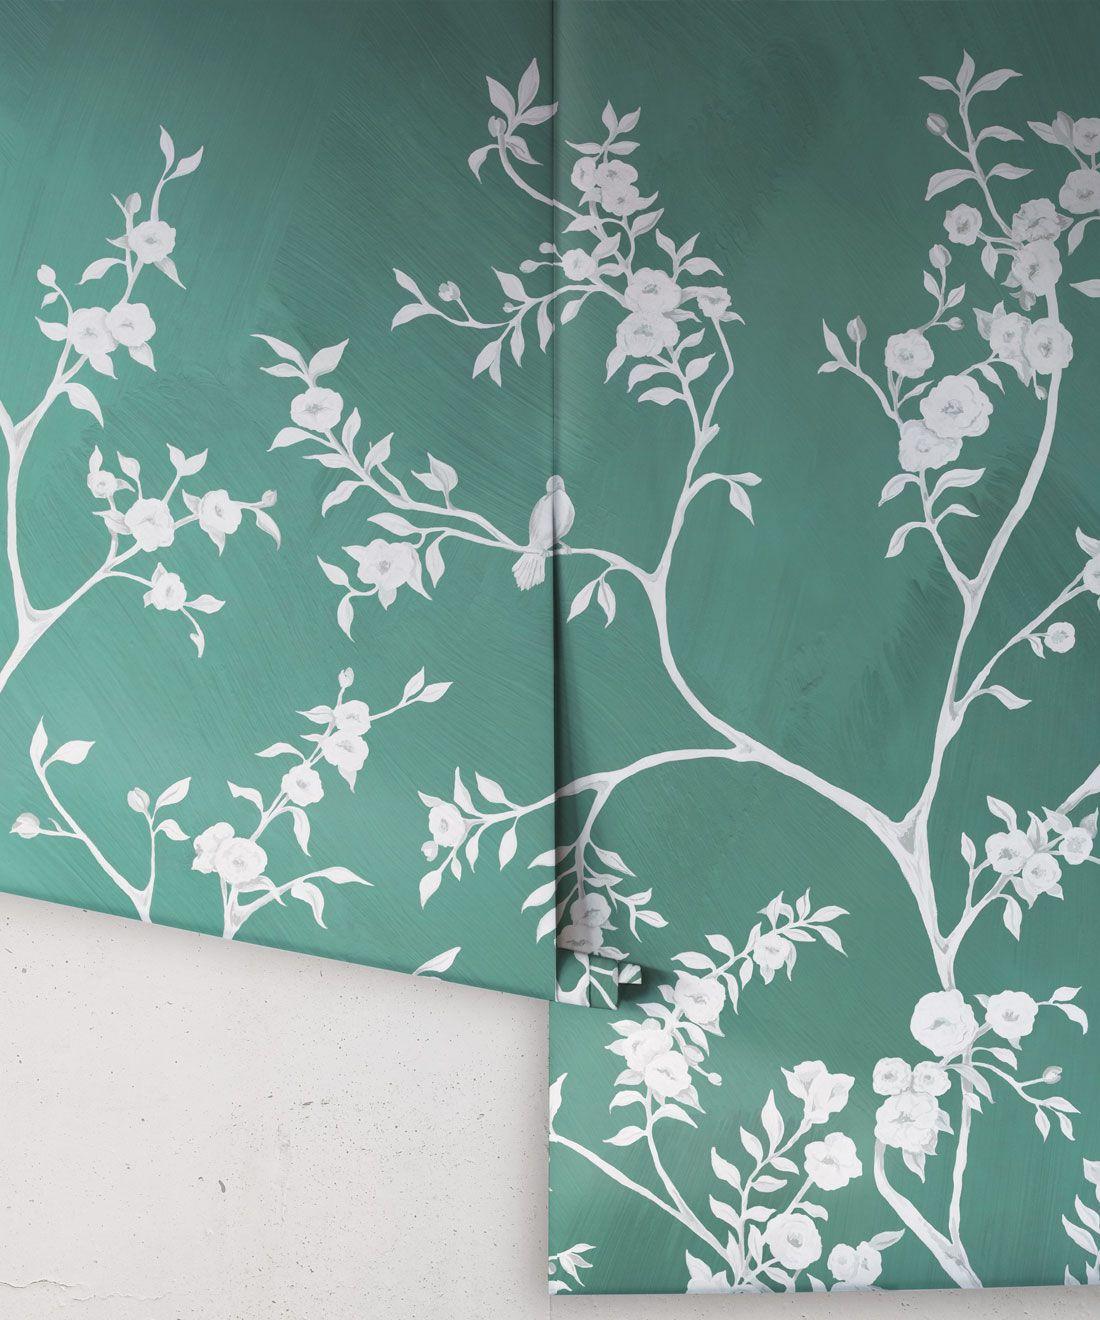 Blooming Joy • Chinoiserie Wallpaper by Danica Andler • Jade Rolls